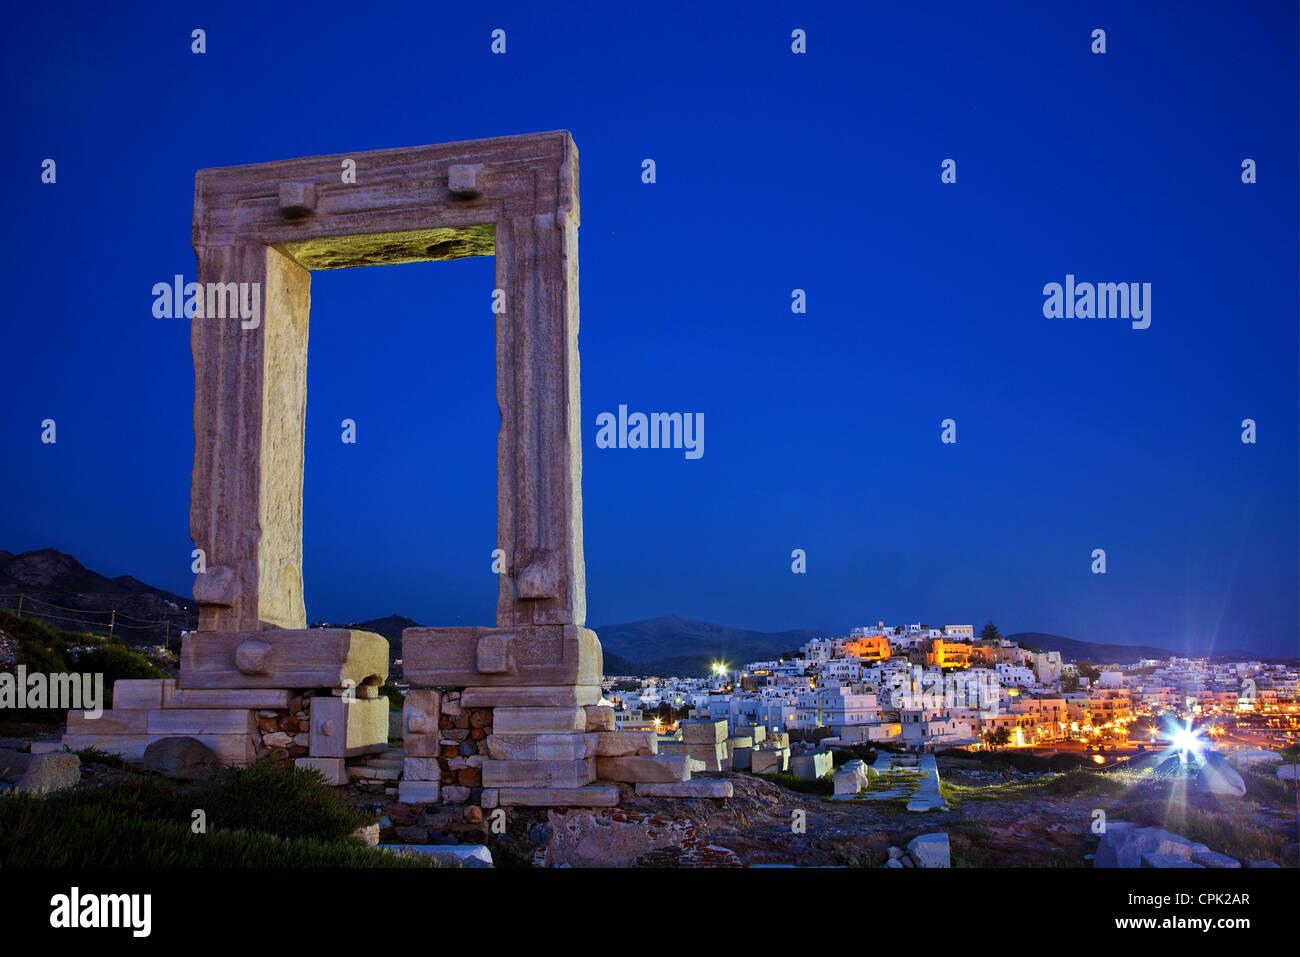 "A Portara (templo de Apolo) e o Chora ('capital"") de Naxos em segundo plano. Cíclades, Grécia Imagens de Stock"